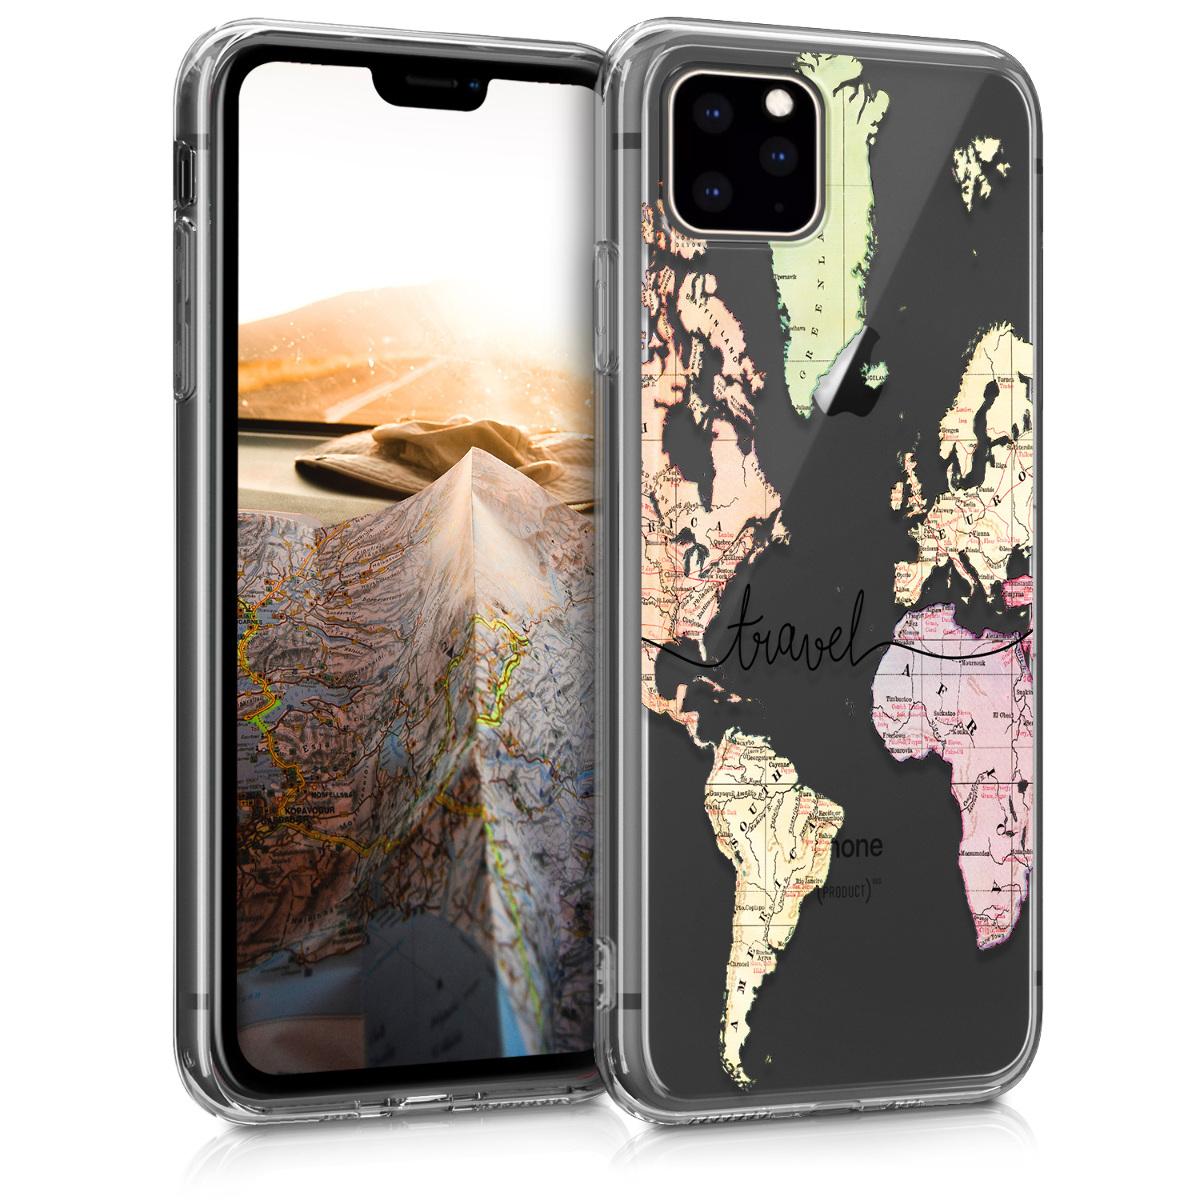 KW Θήκη Σιλικόνης iPhone 11 Pro -  Black / Multicolor / Transparent (49792.02)